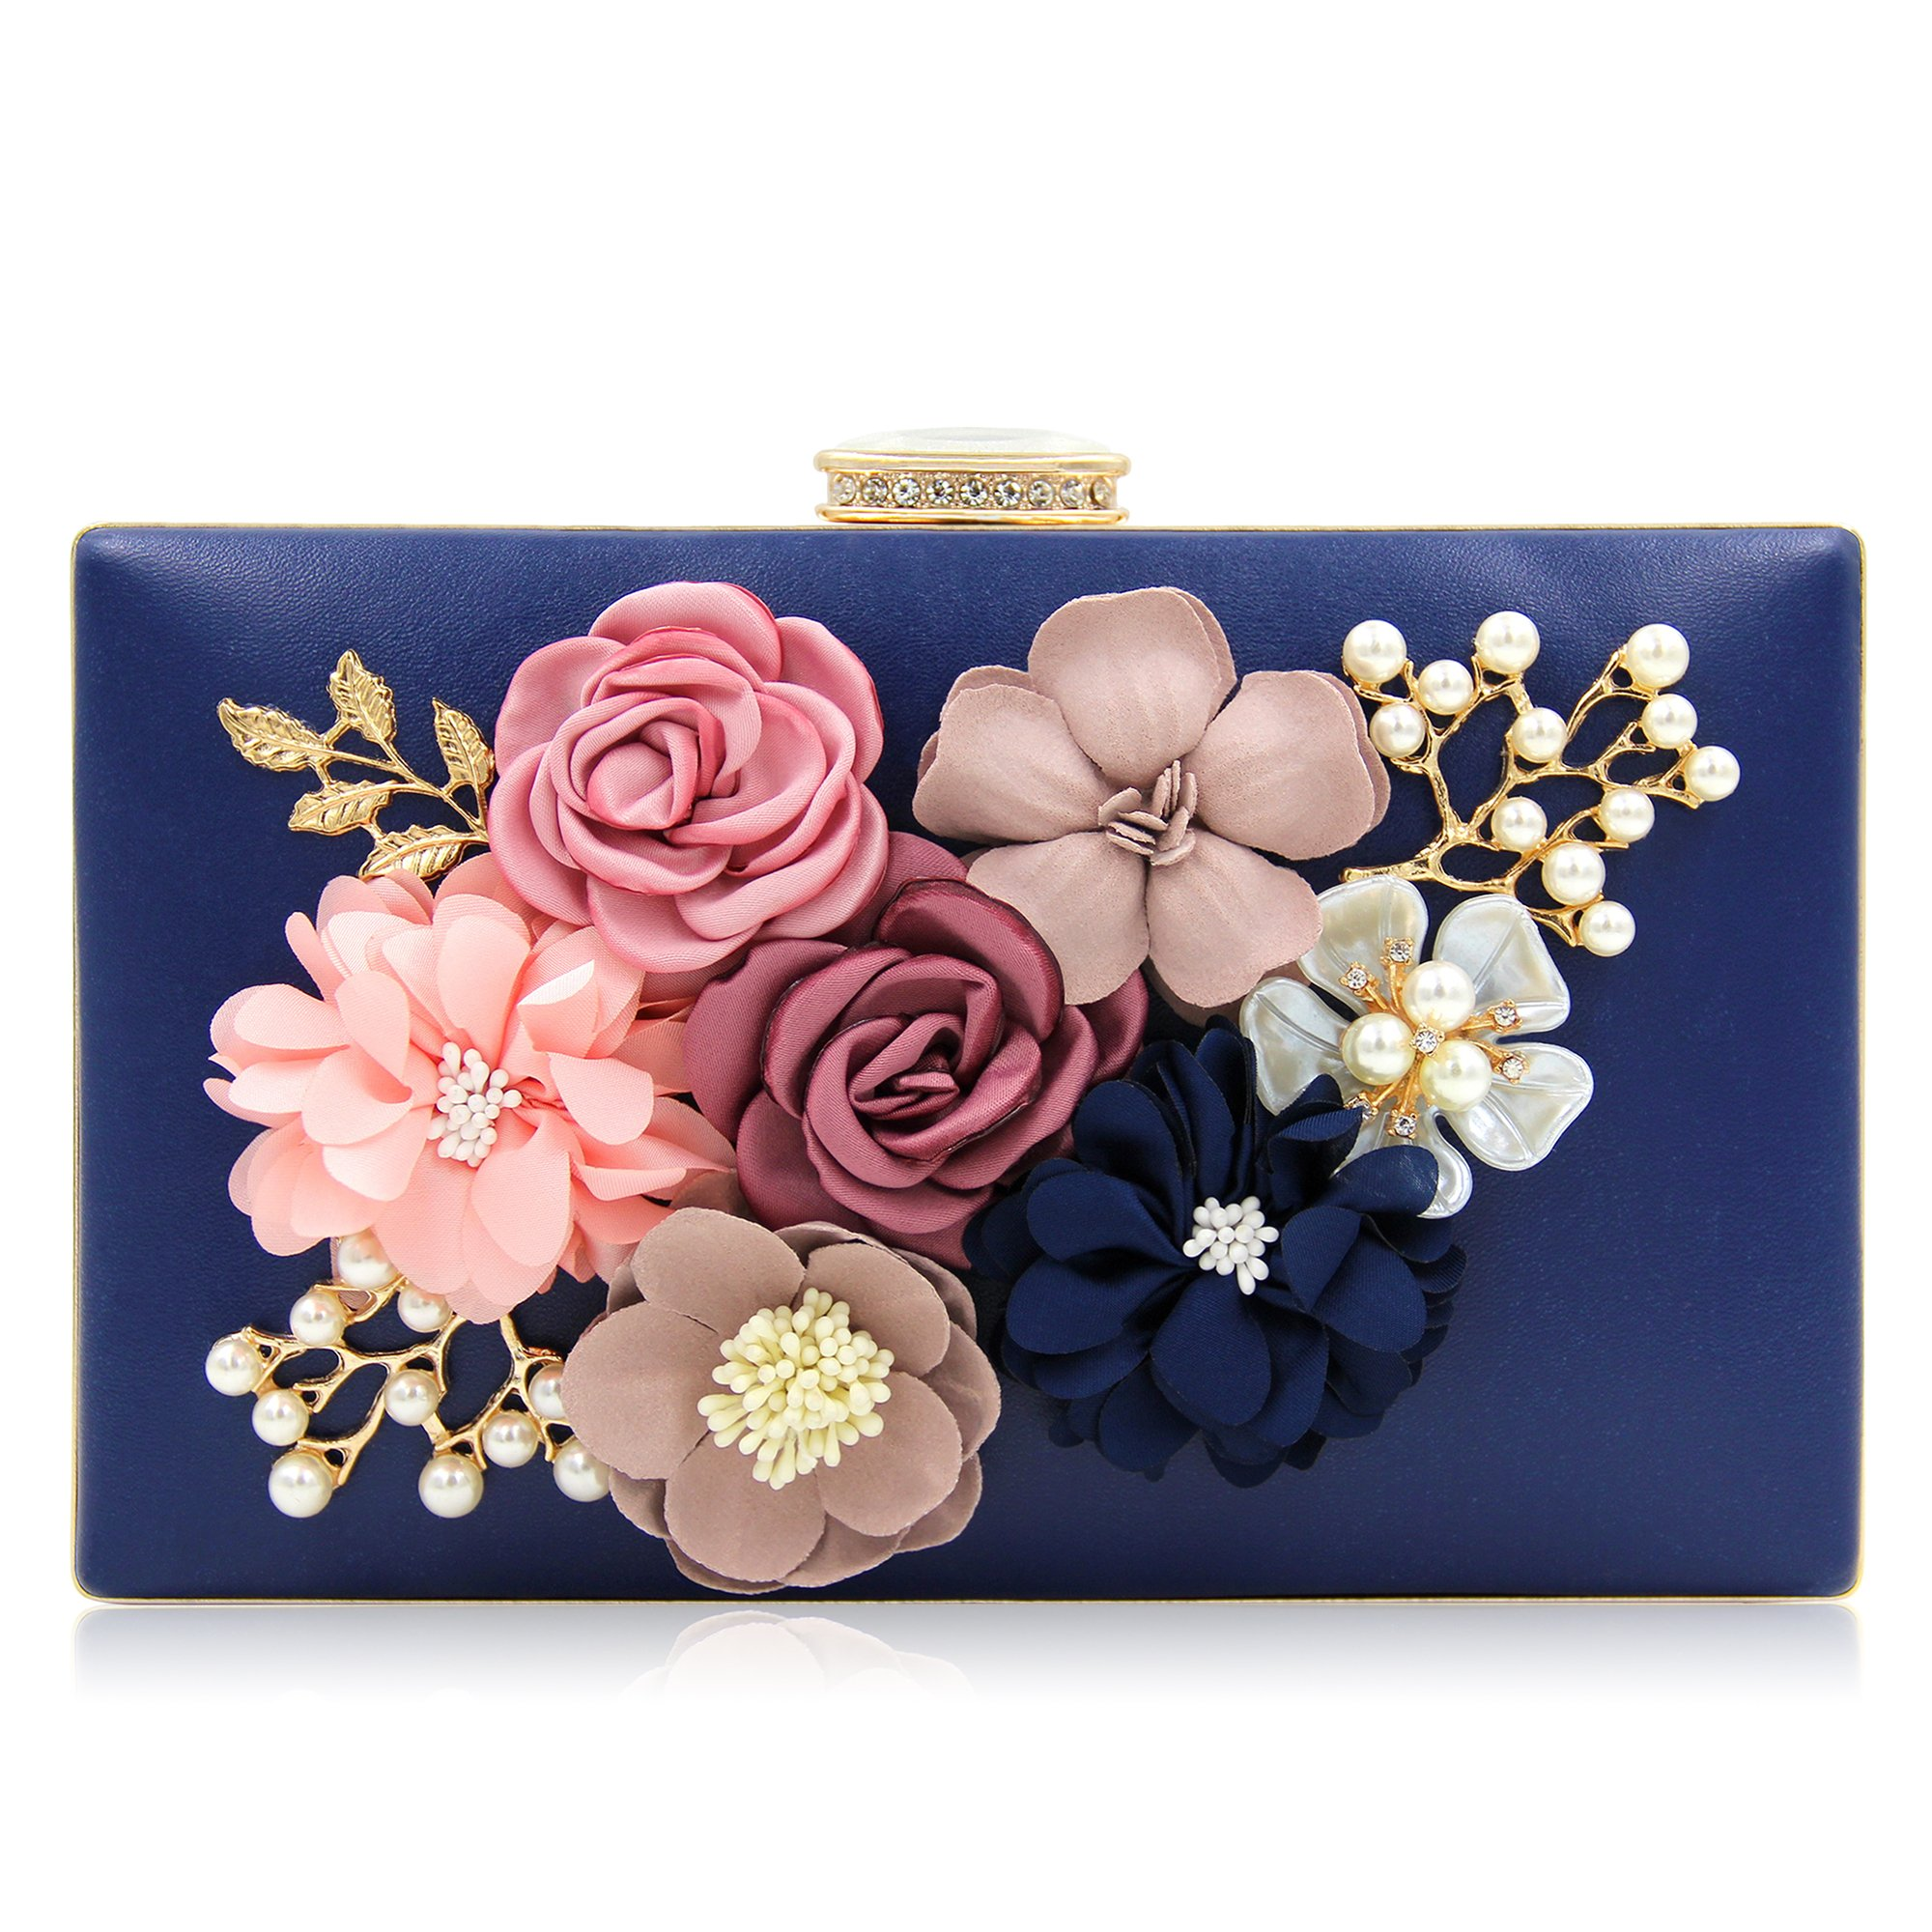 Milisente Women Flower Clutches Evening Bags Handbags Wedding Clutch Purse (Navy Blue) by Milisente